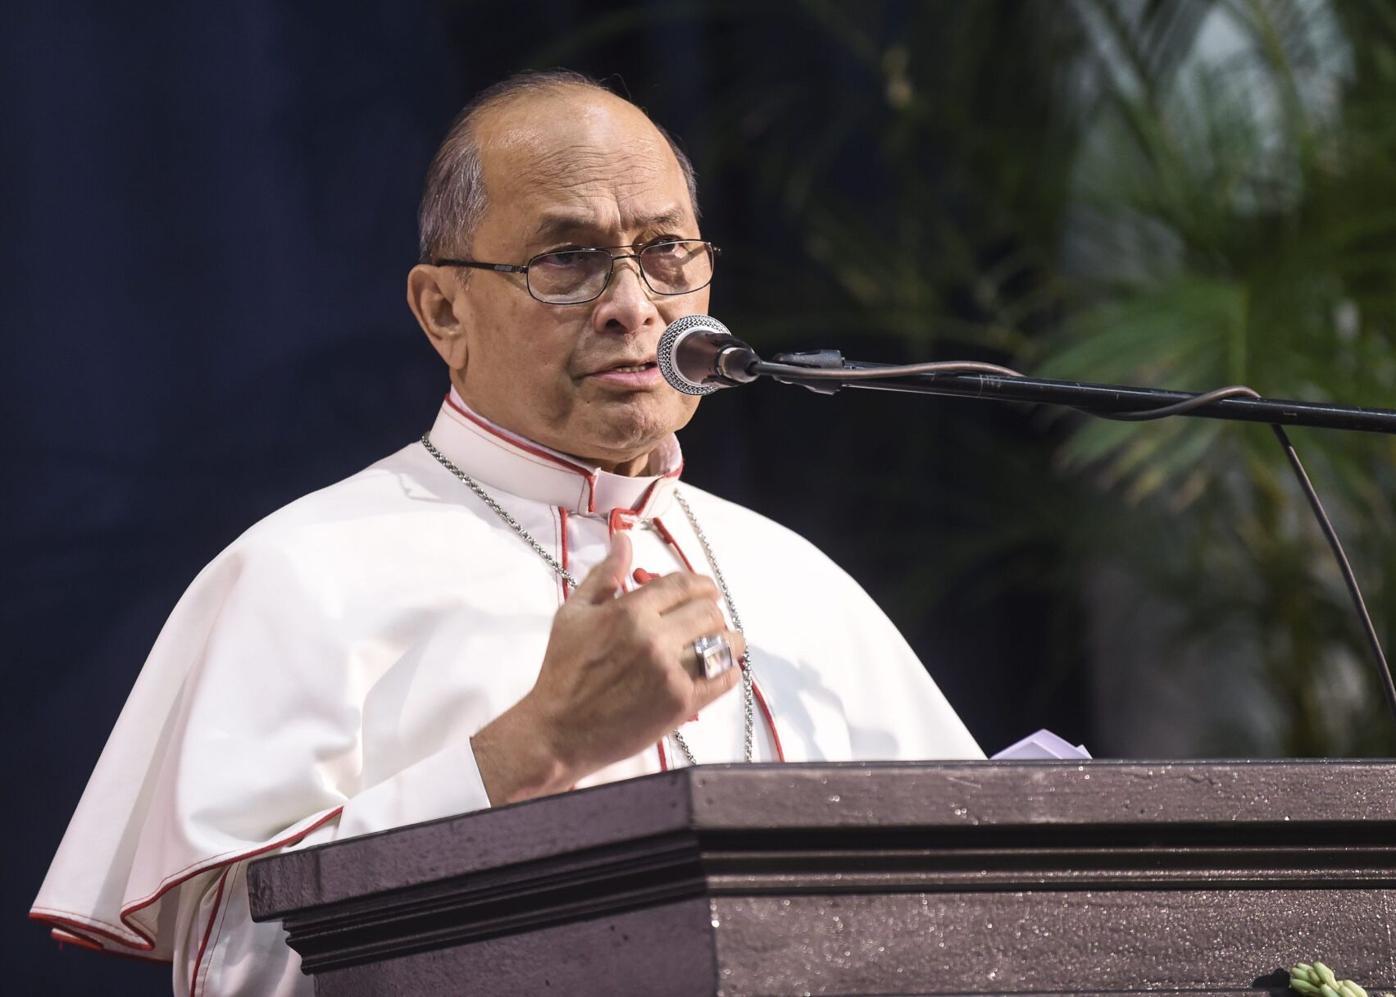 636012901660661385-GUATab-06-01-2016-PDN-1-A001--2016-05-31-IMG-Archbishop-Anthony-A-1-1-HUEHS7JG-L820607745-IMG-Archbishop-Anthony-A-1-1-HUEHS7JG.jpg